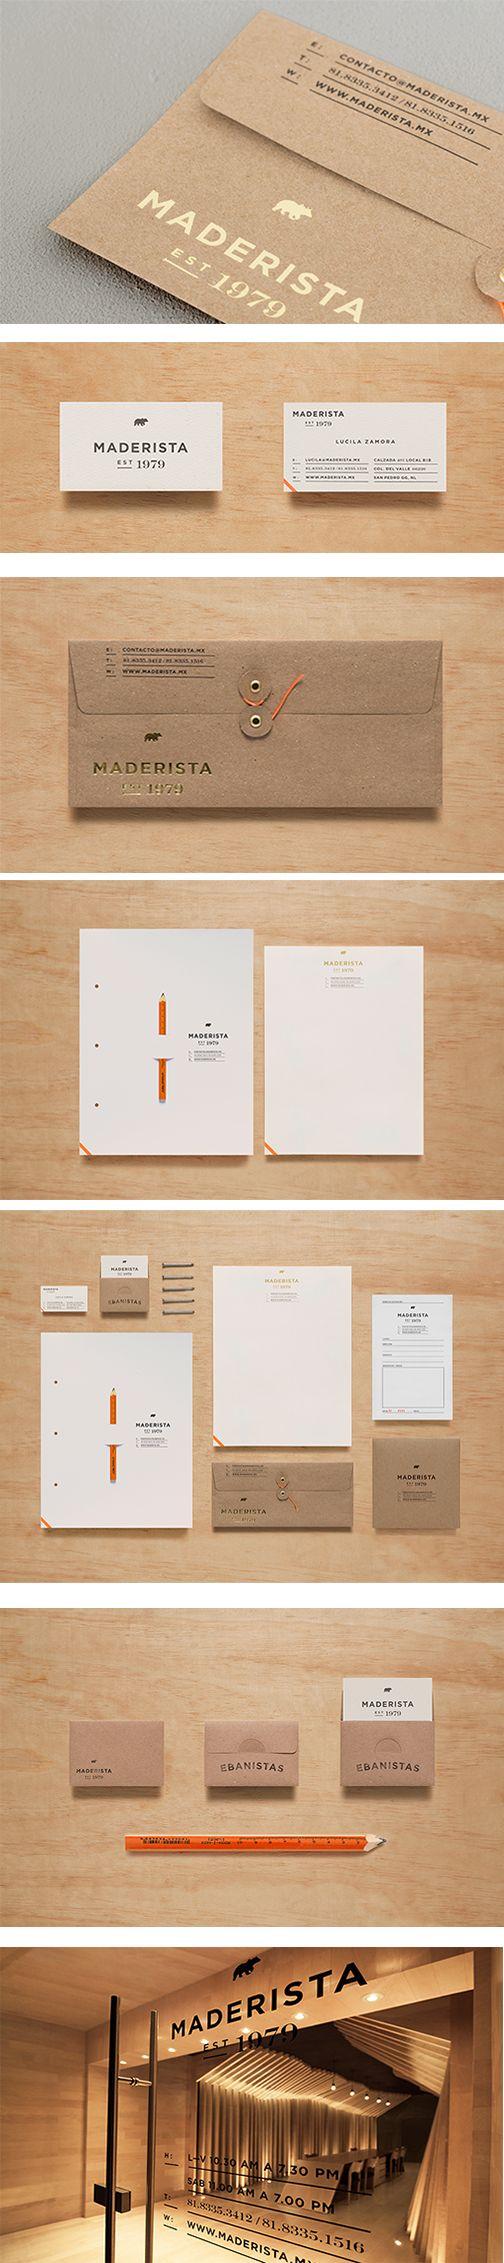 Made risks | #stationary #corporate #design #corporatedesign #identity #branding #marketing < repinned by www.BlickeDeeler.de | Take a look at www.LogoGestaltung-Hamburg.de